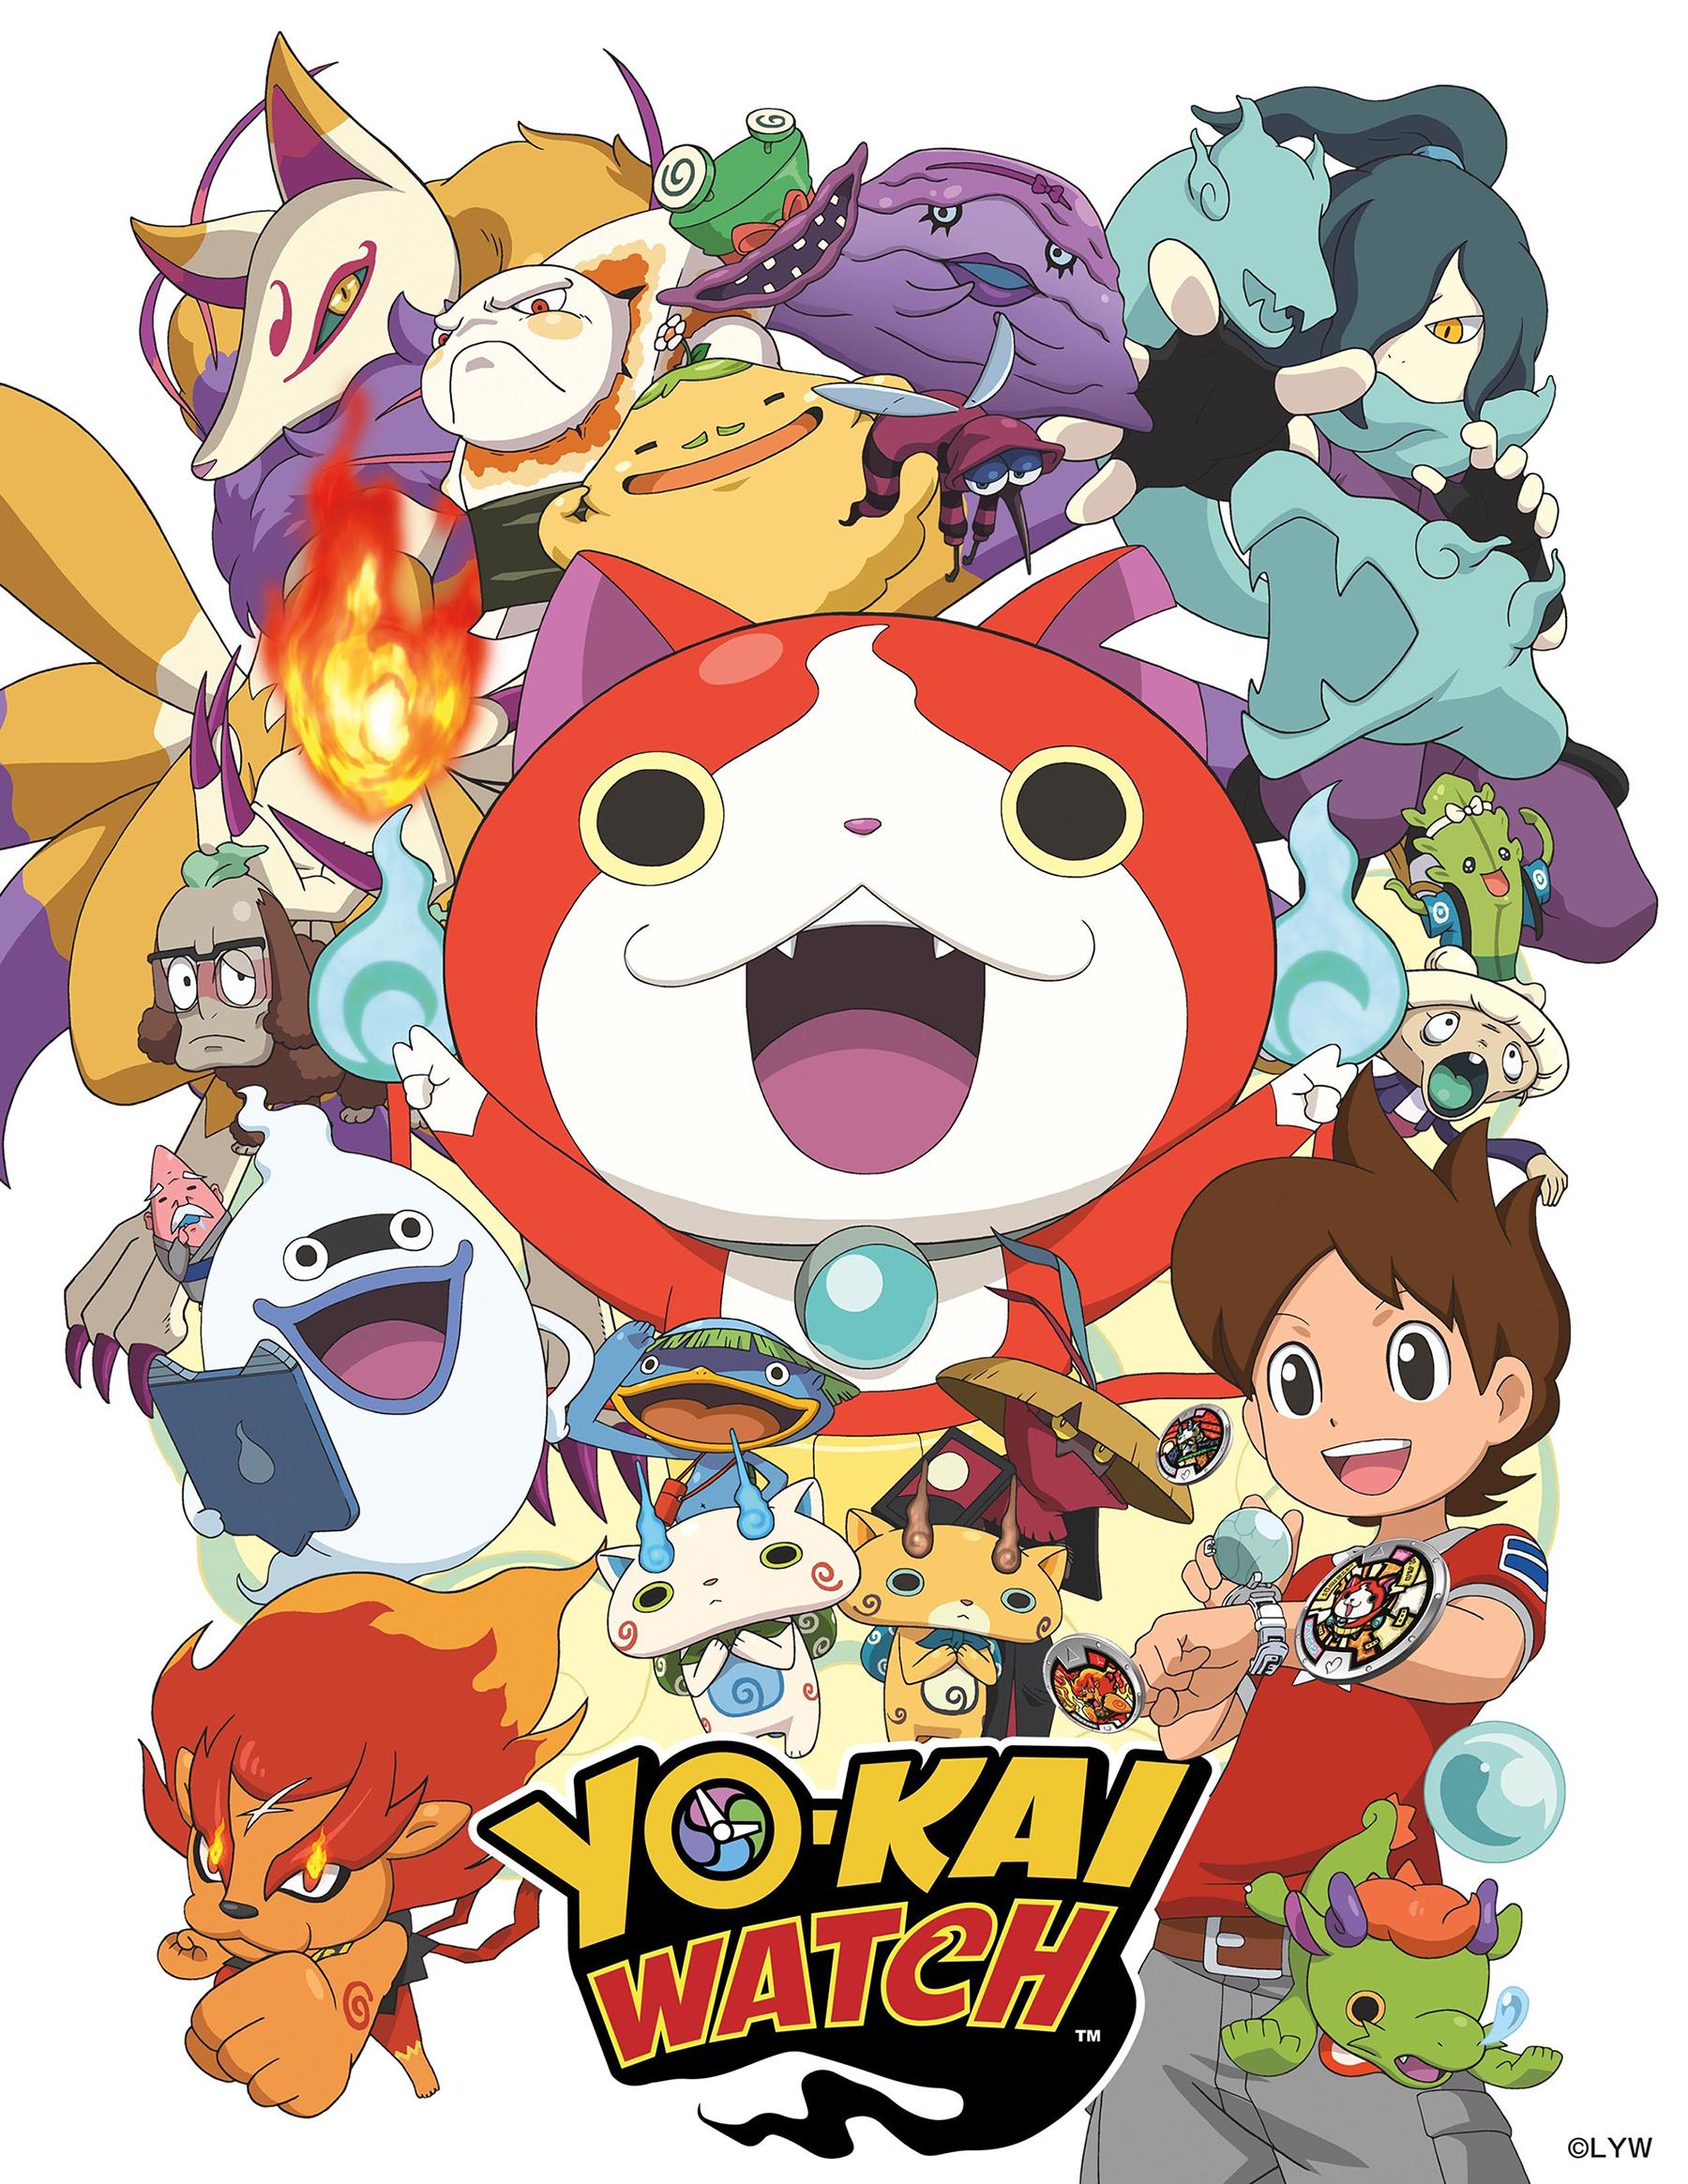 youkai watch anime visual haruhichan.com yokai watch visual